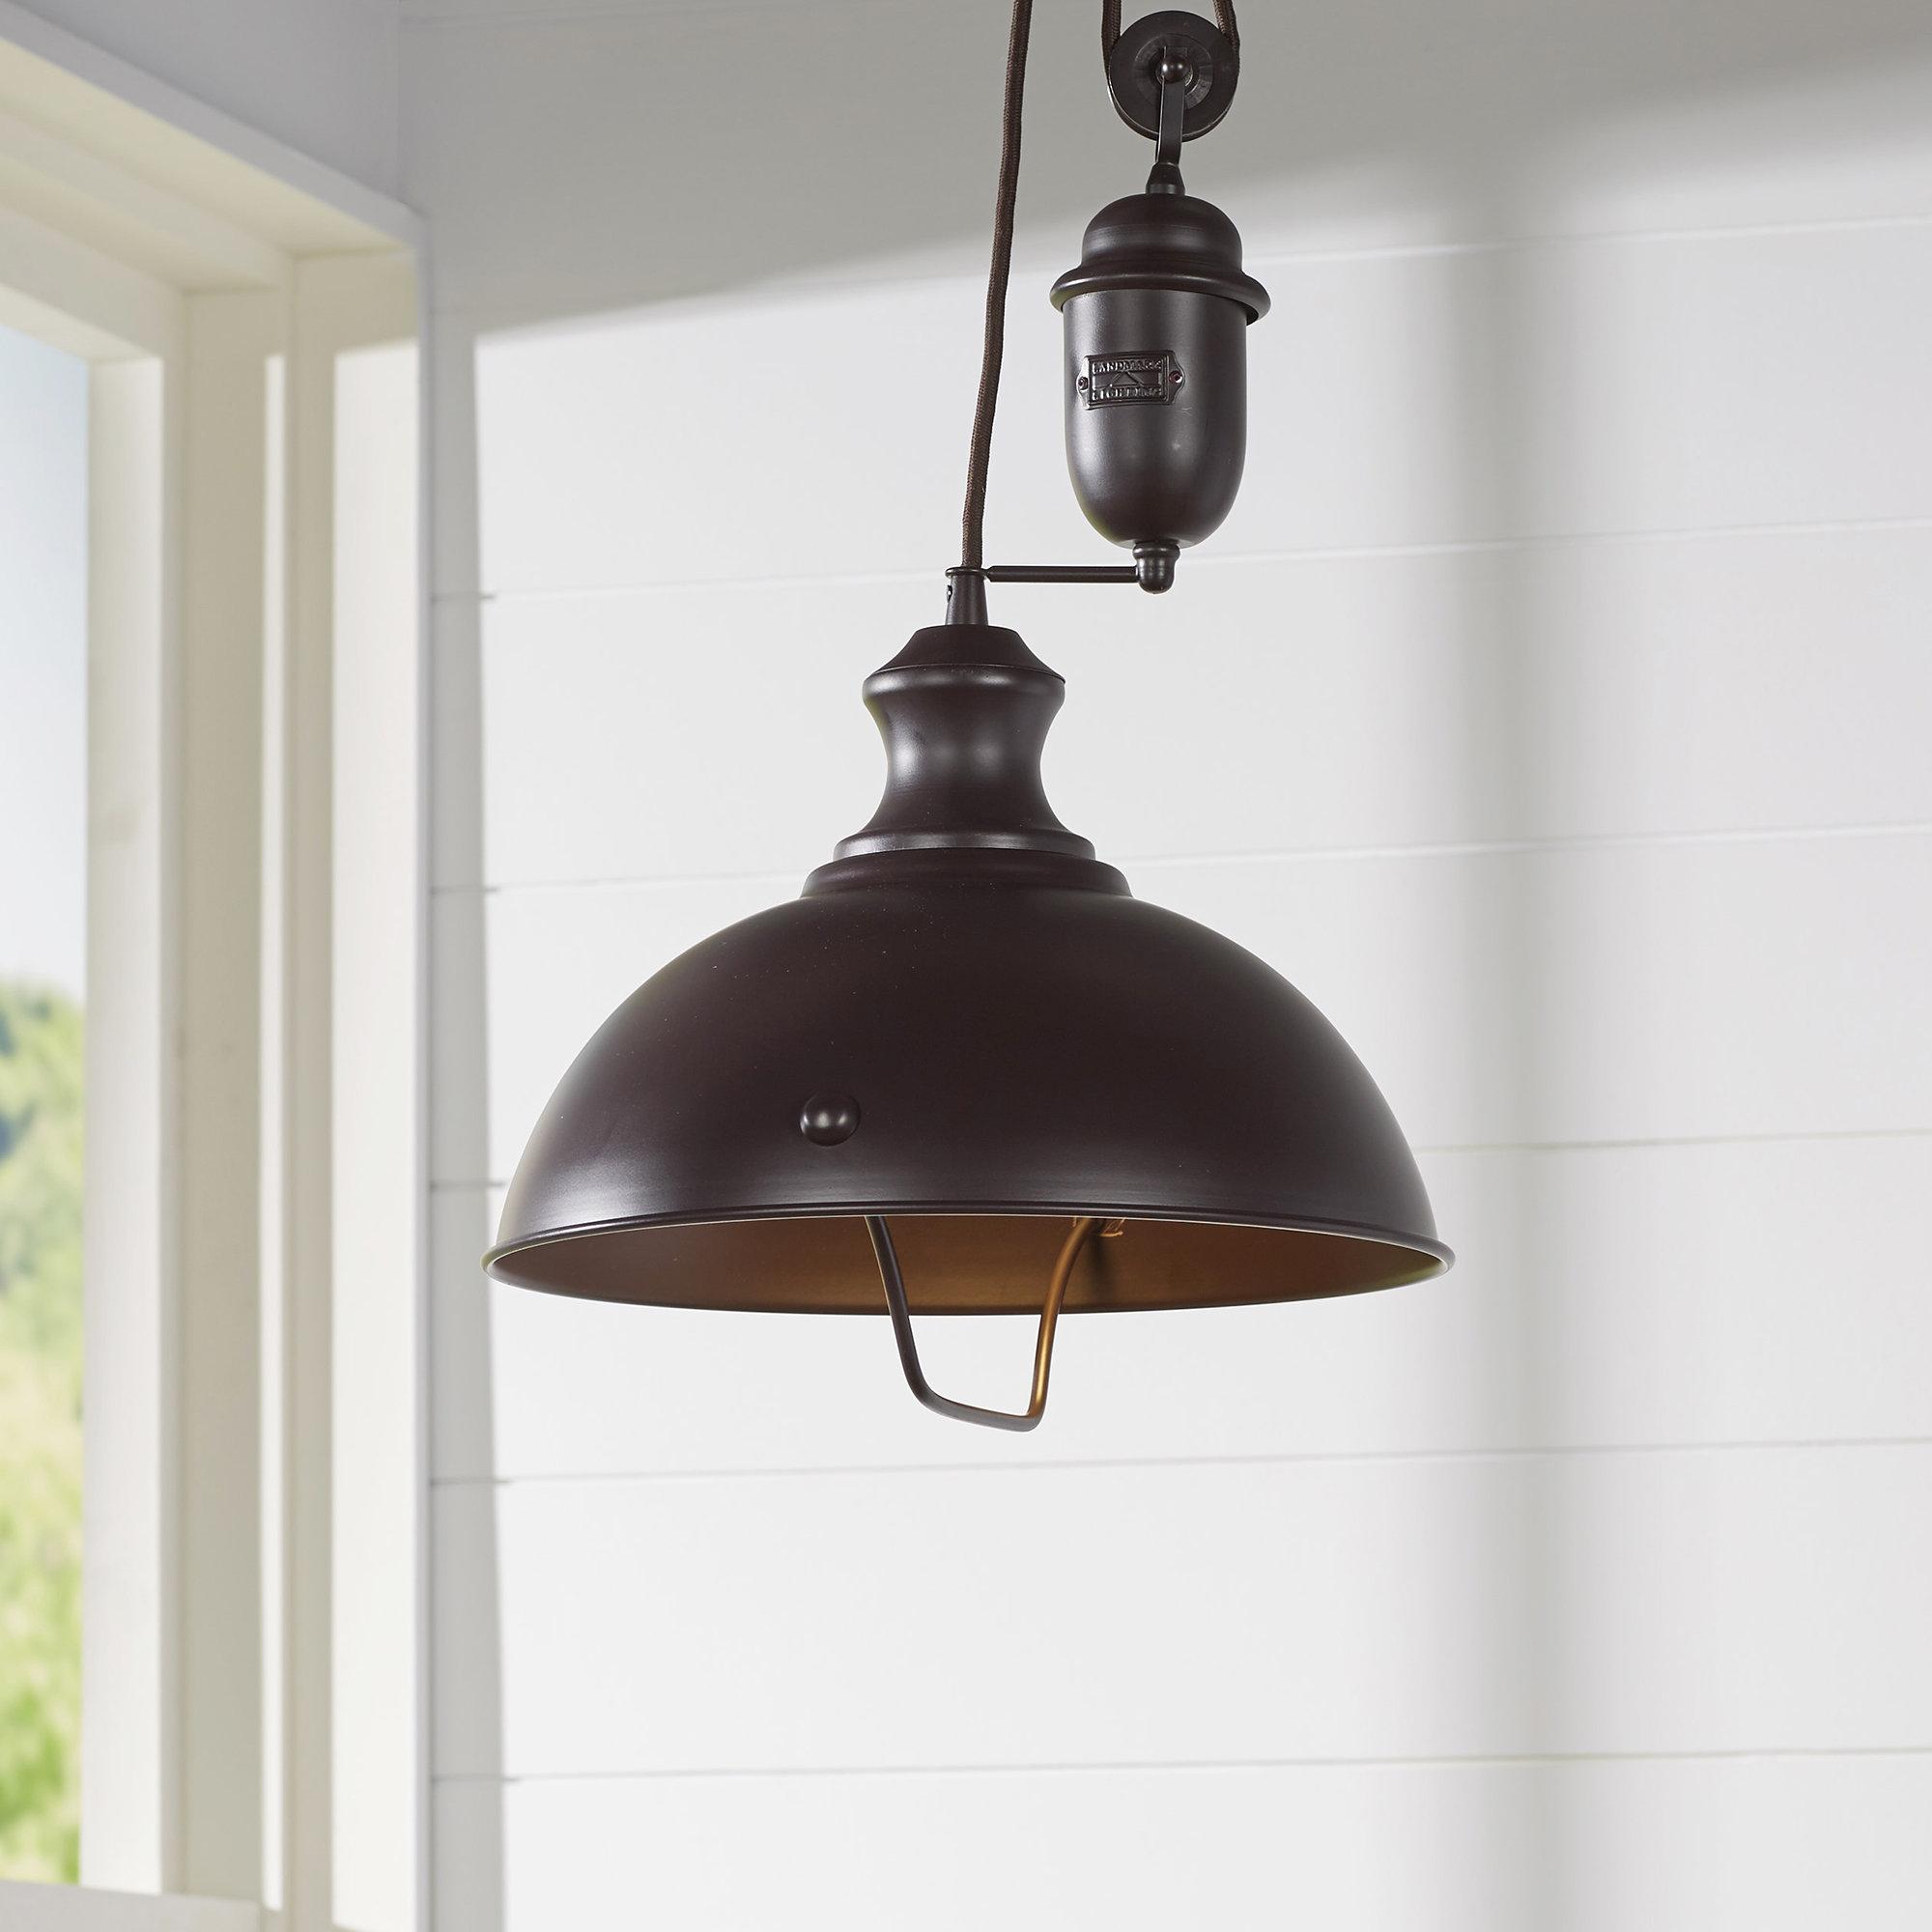 Rodriques 1 Light Bowl Pendant With Stetson 1 Light Bowl Pendants (Gallery 5 of 30)